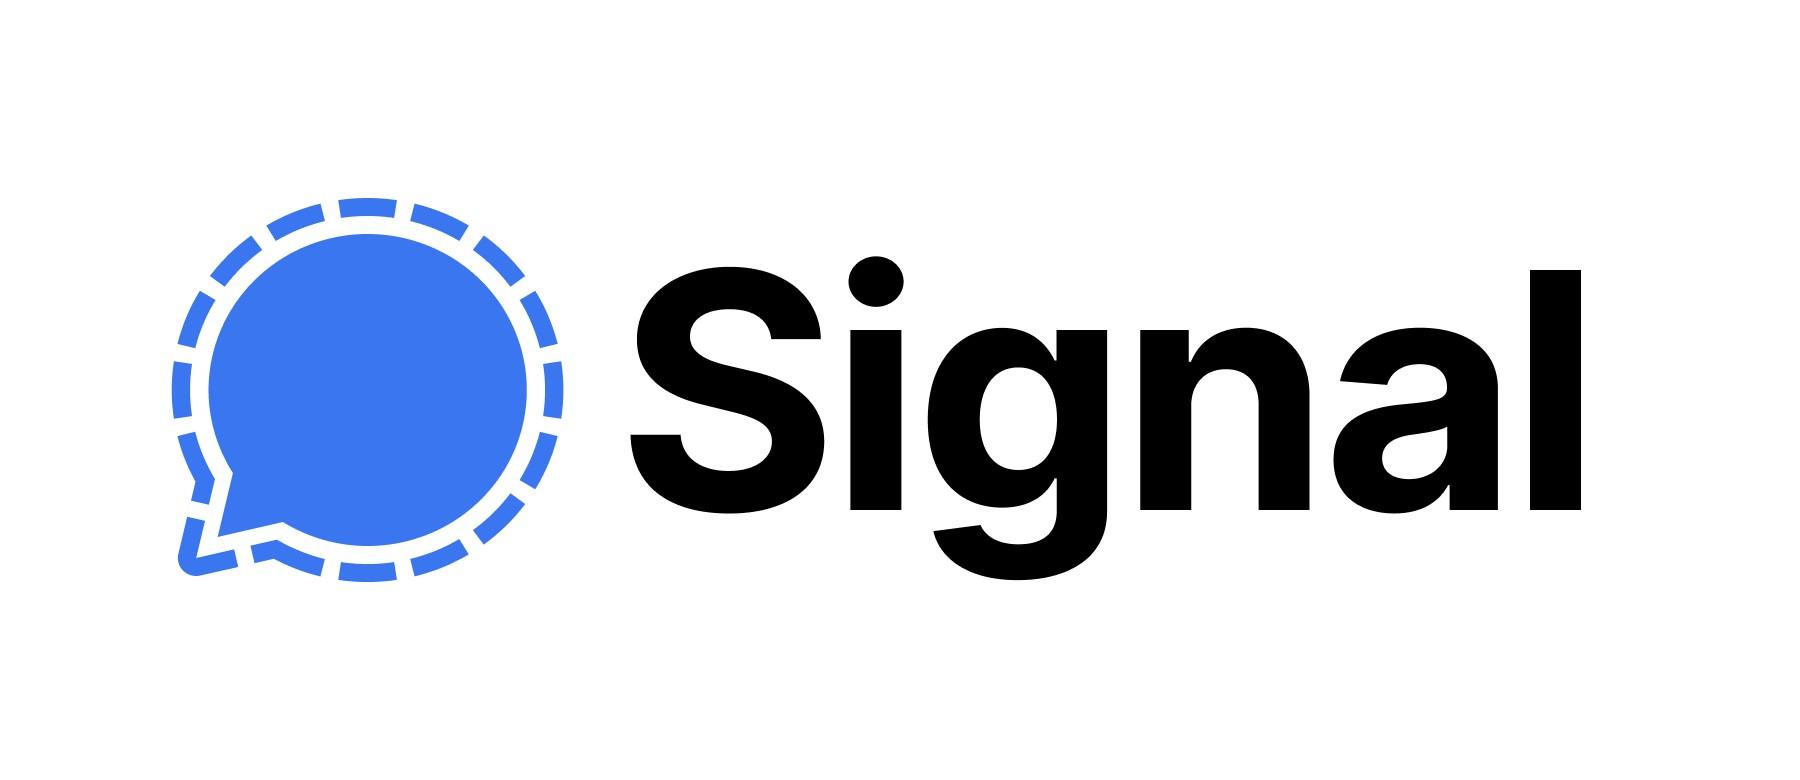 telegram alternative signal